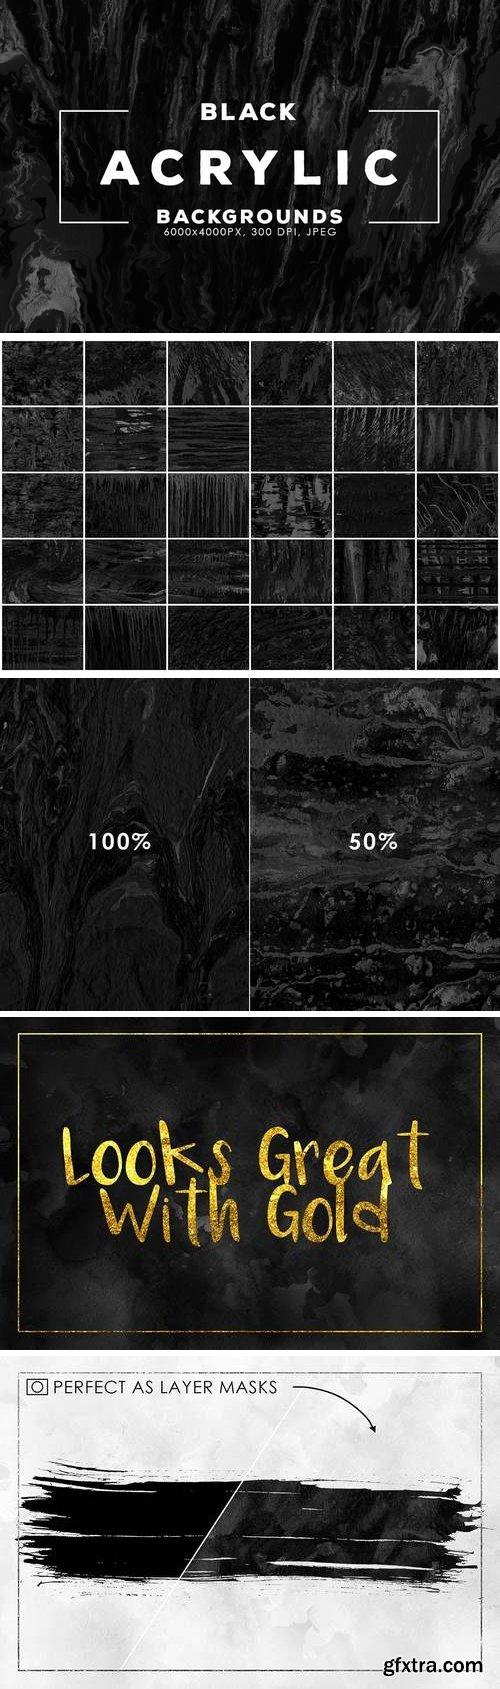 Black Acrylic Backgrounds